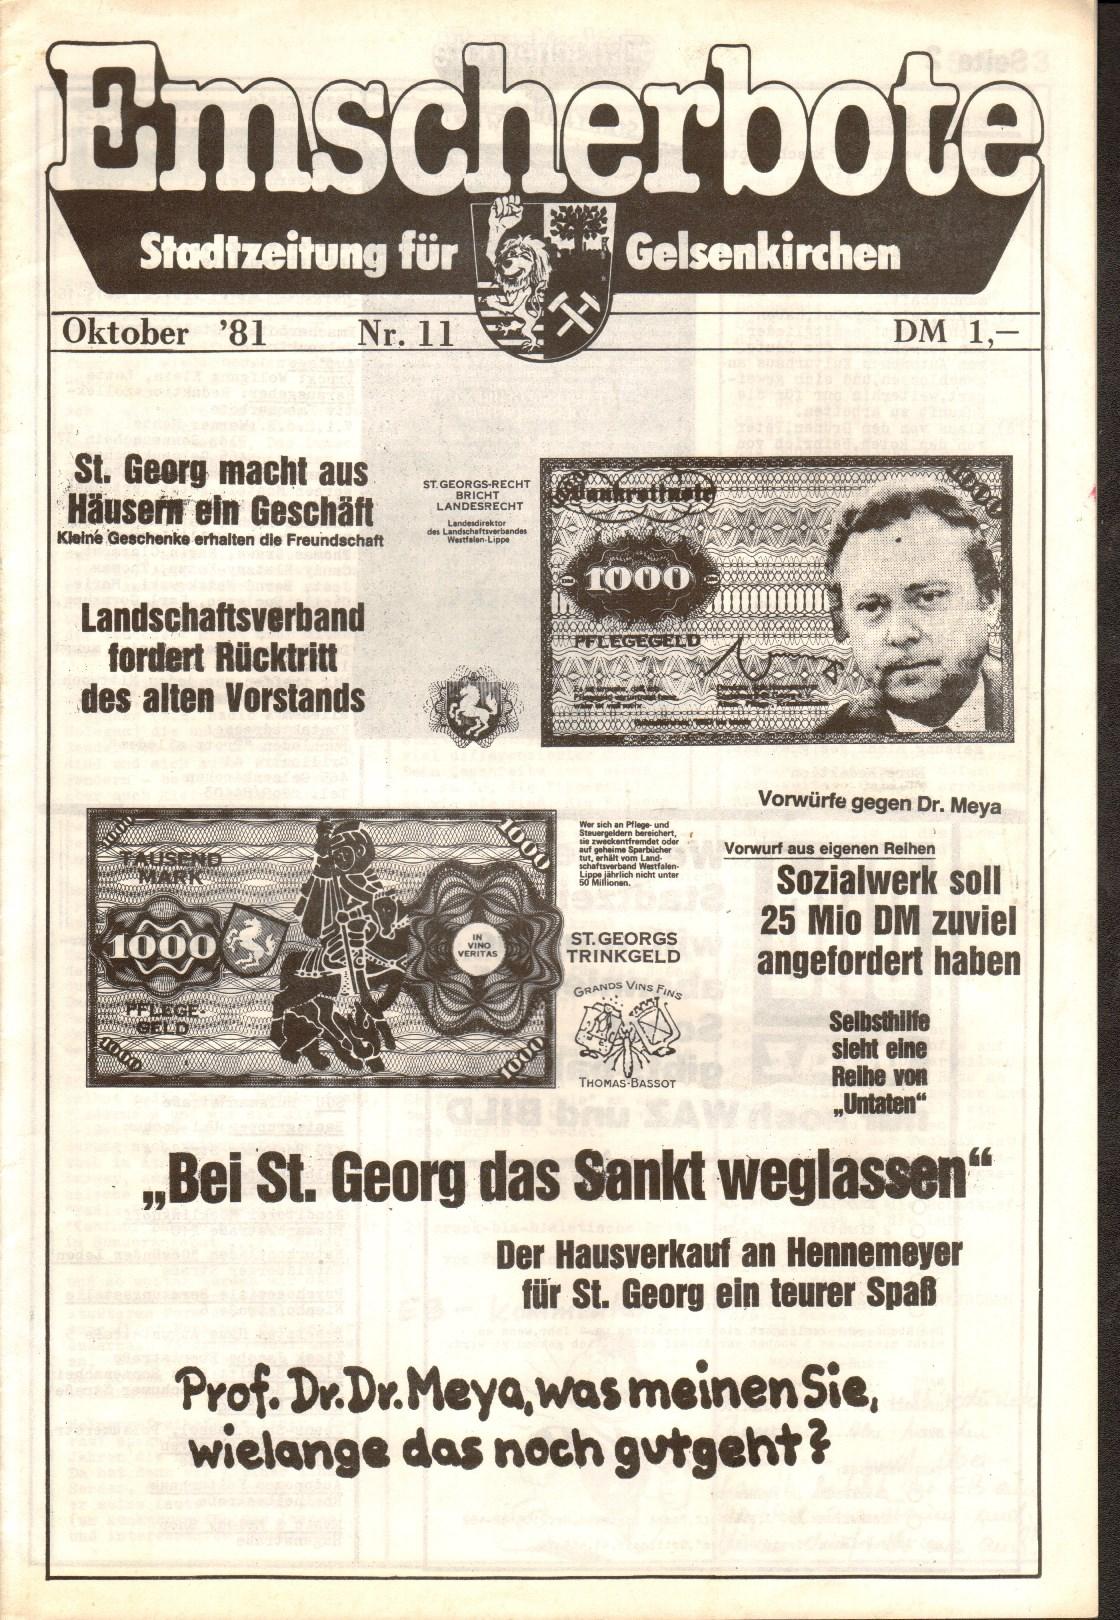 Gelsenkirchen_Emscherbote_1981_11_01